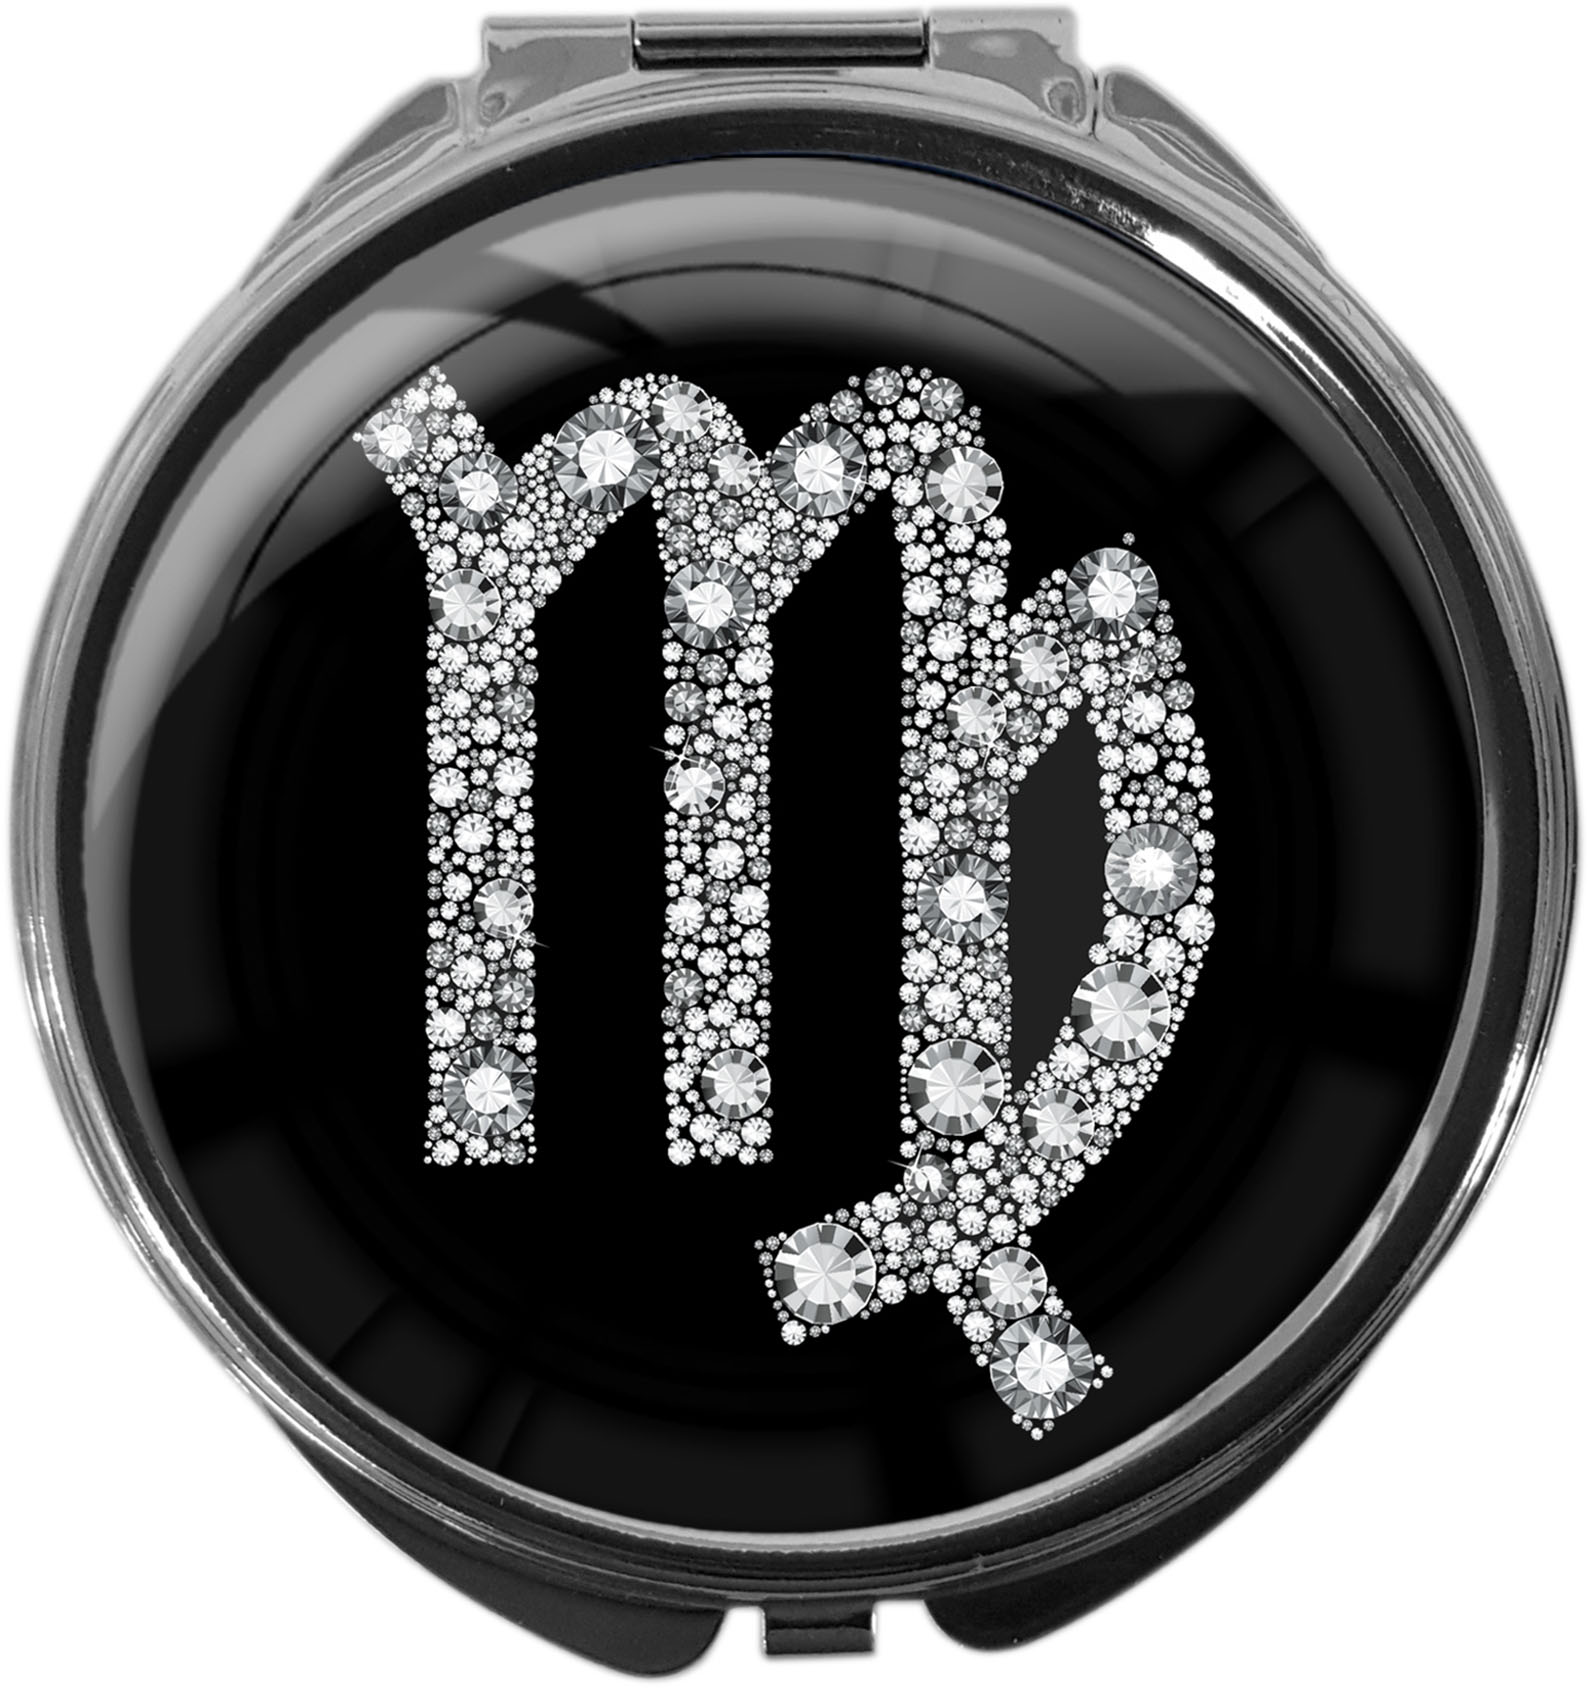 Tablettenbox aus Metall | STERNZEICHEN JUNGFRAU | metALUm #00069